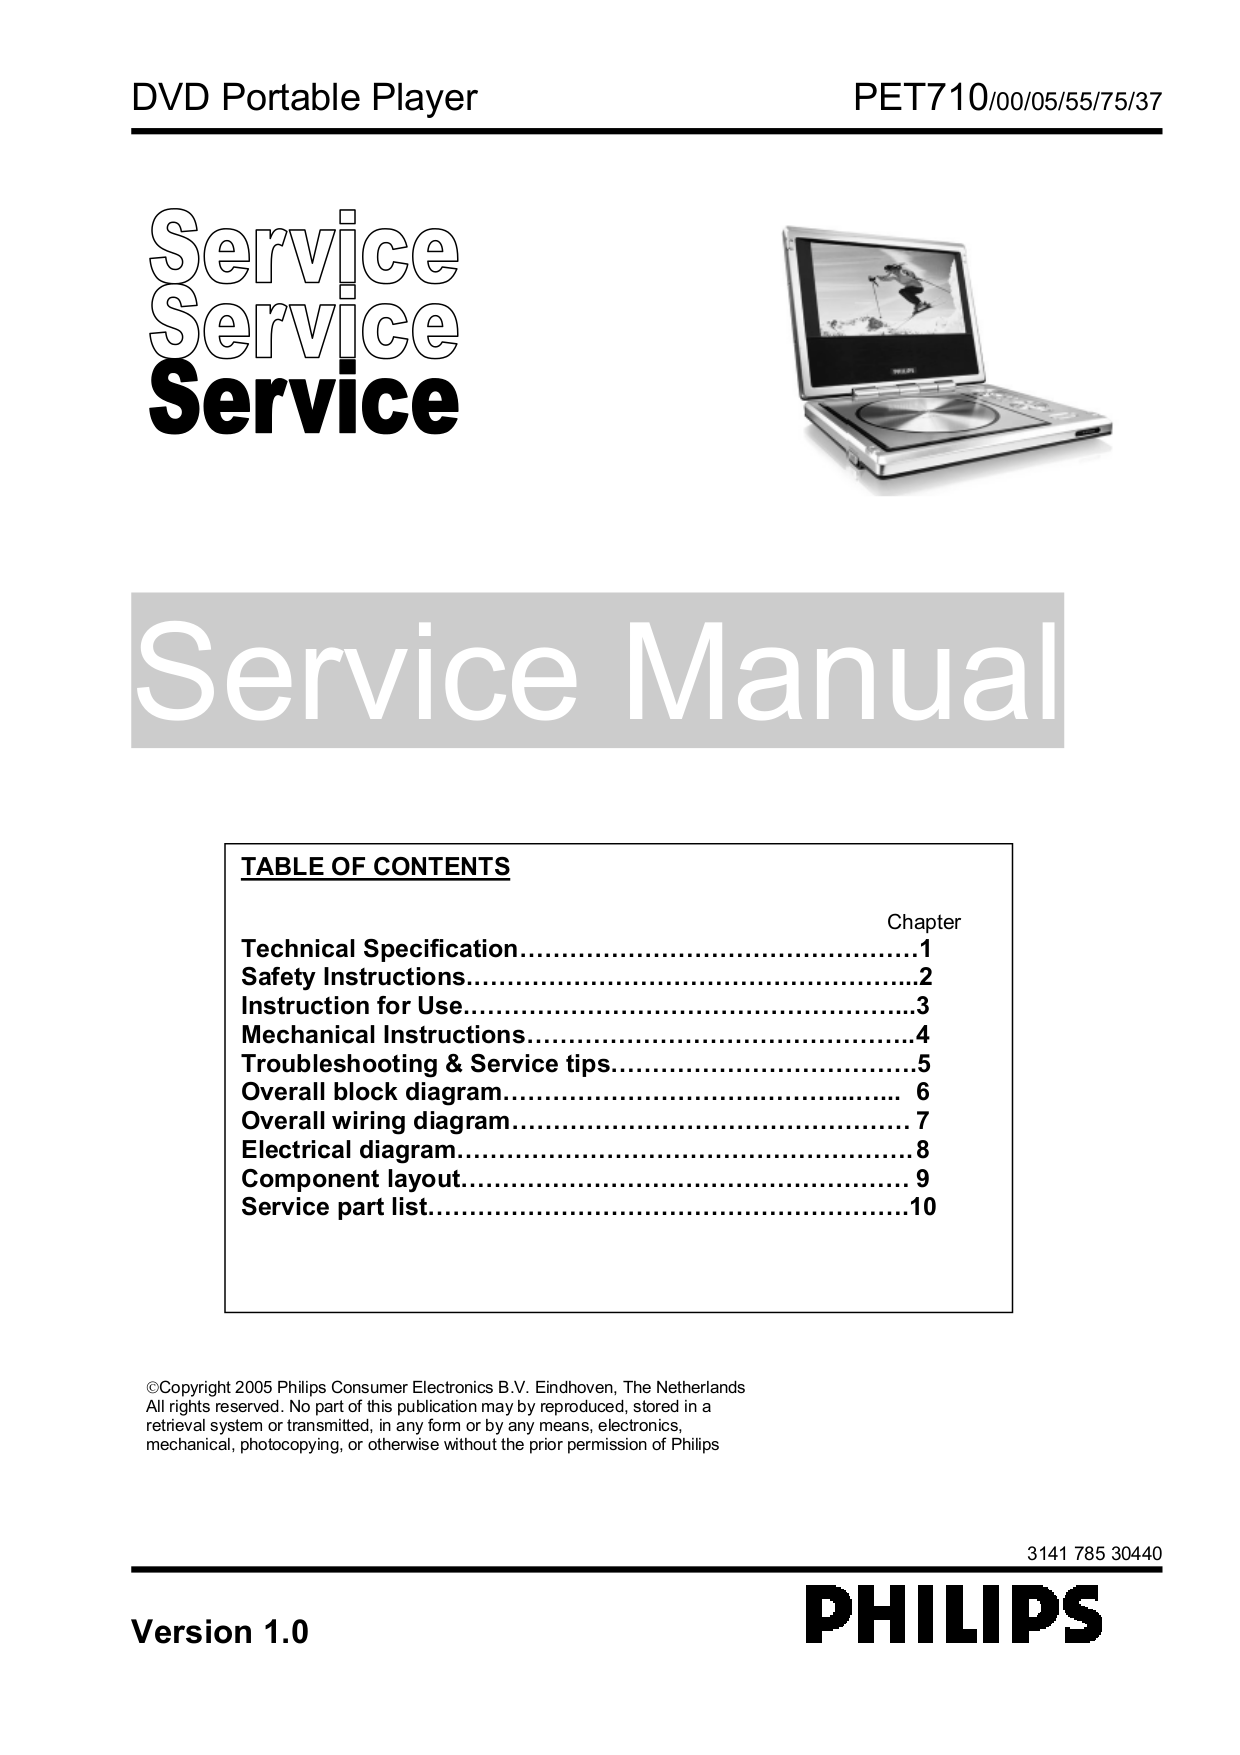 download free pdf for philips pet710 portable dvd player manual rh umlib com Philips Electronics DVD Players Philips Electronics DVD Players